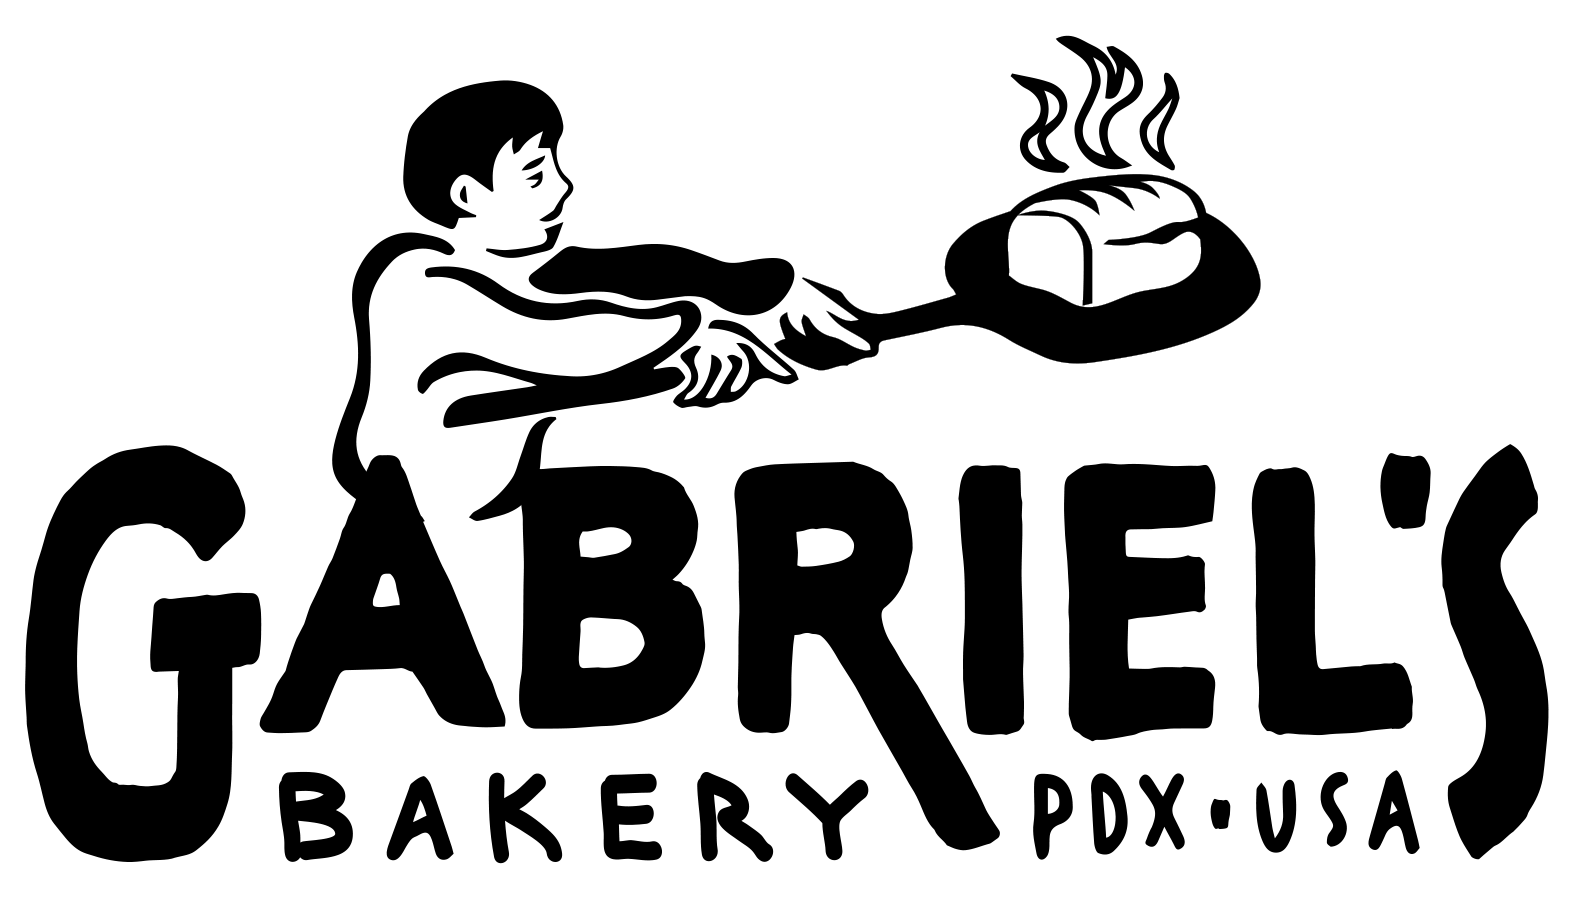 Clipart bread logo. Gabriel s bakery for